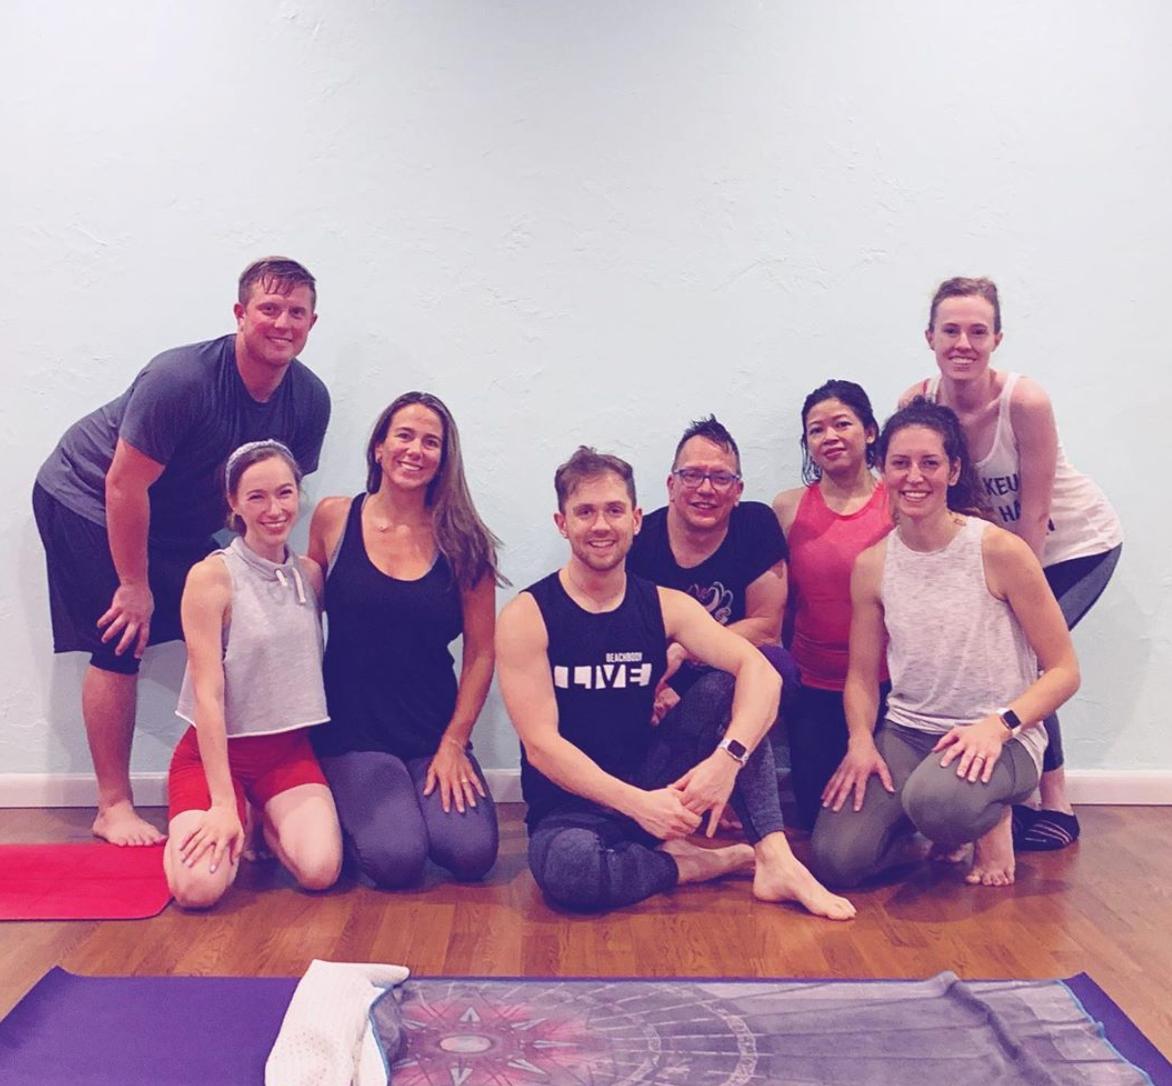 thor teaChing the wonderful ways of piyo yoga. #bootyburn